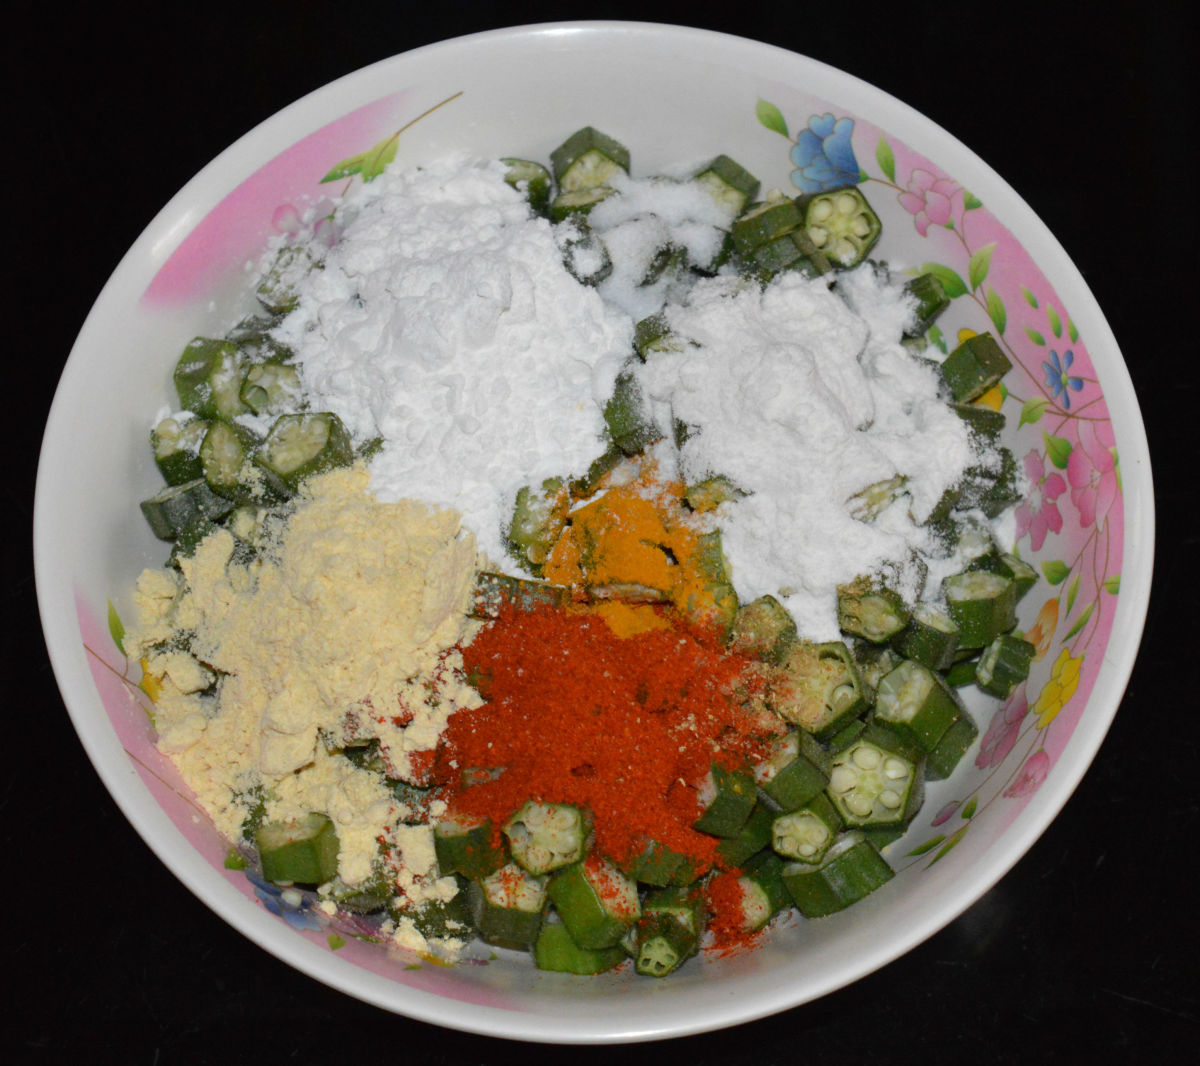 Step 2: Add corn flour, gram flour, rice flour, turmeric powder, red chili powder, chopped green chilies (optional), coriander powder, and salt.